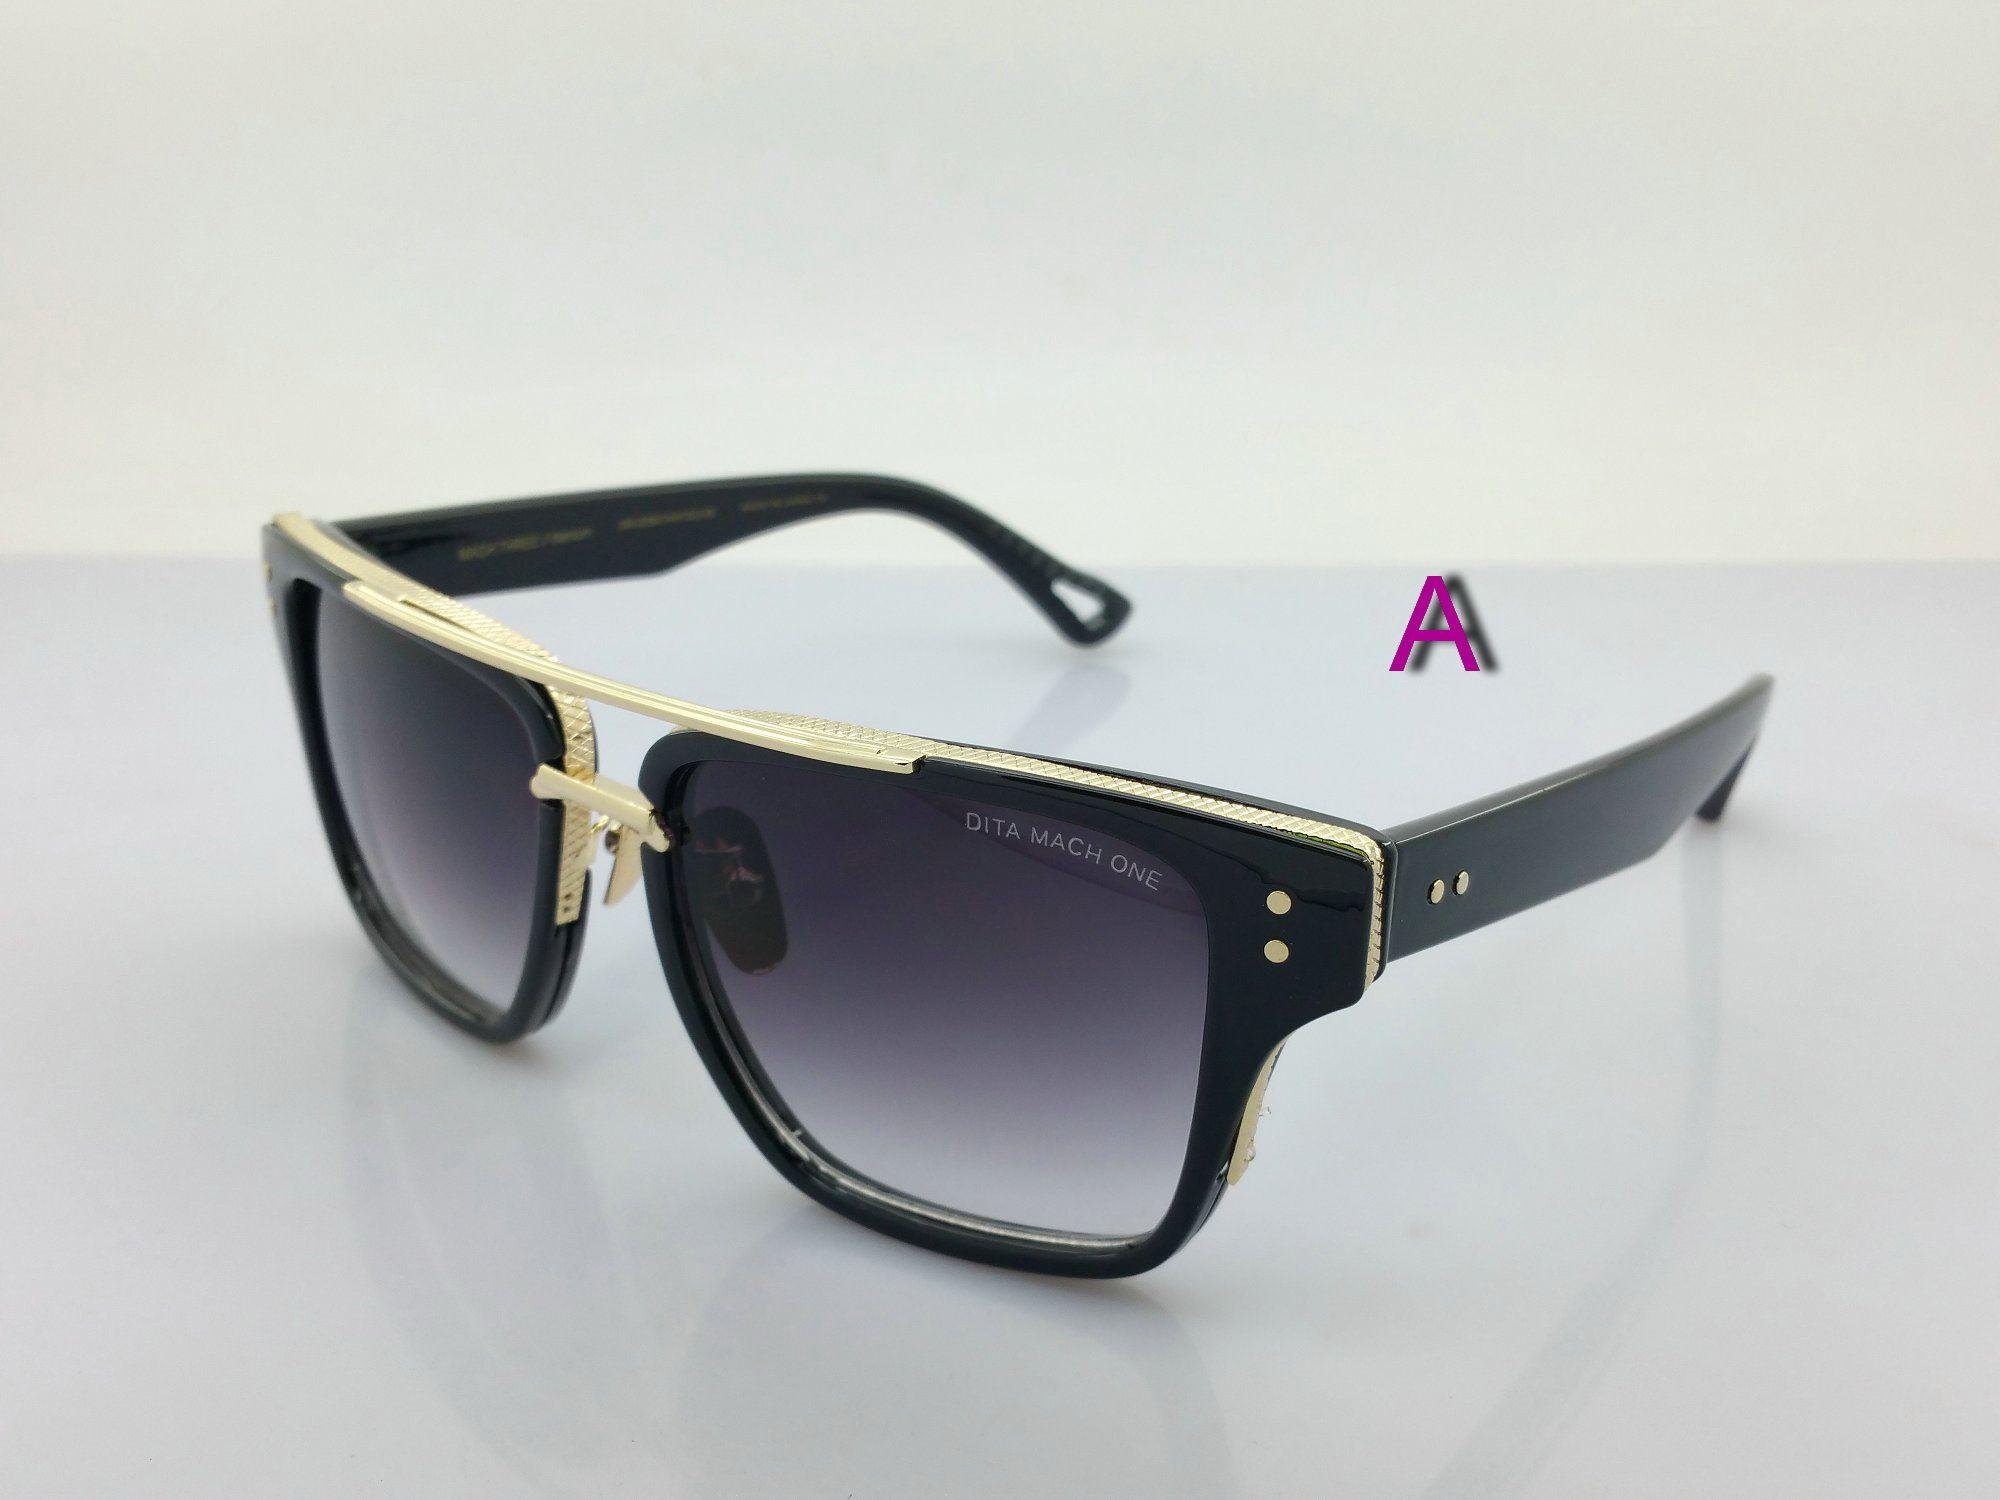 73d677a83b24 Dita Sunglasses Wholesale